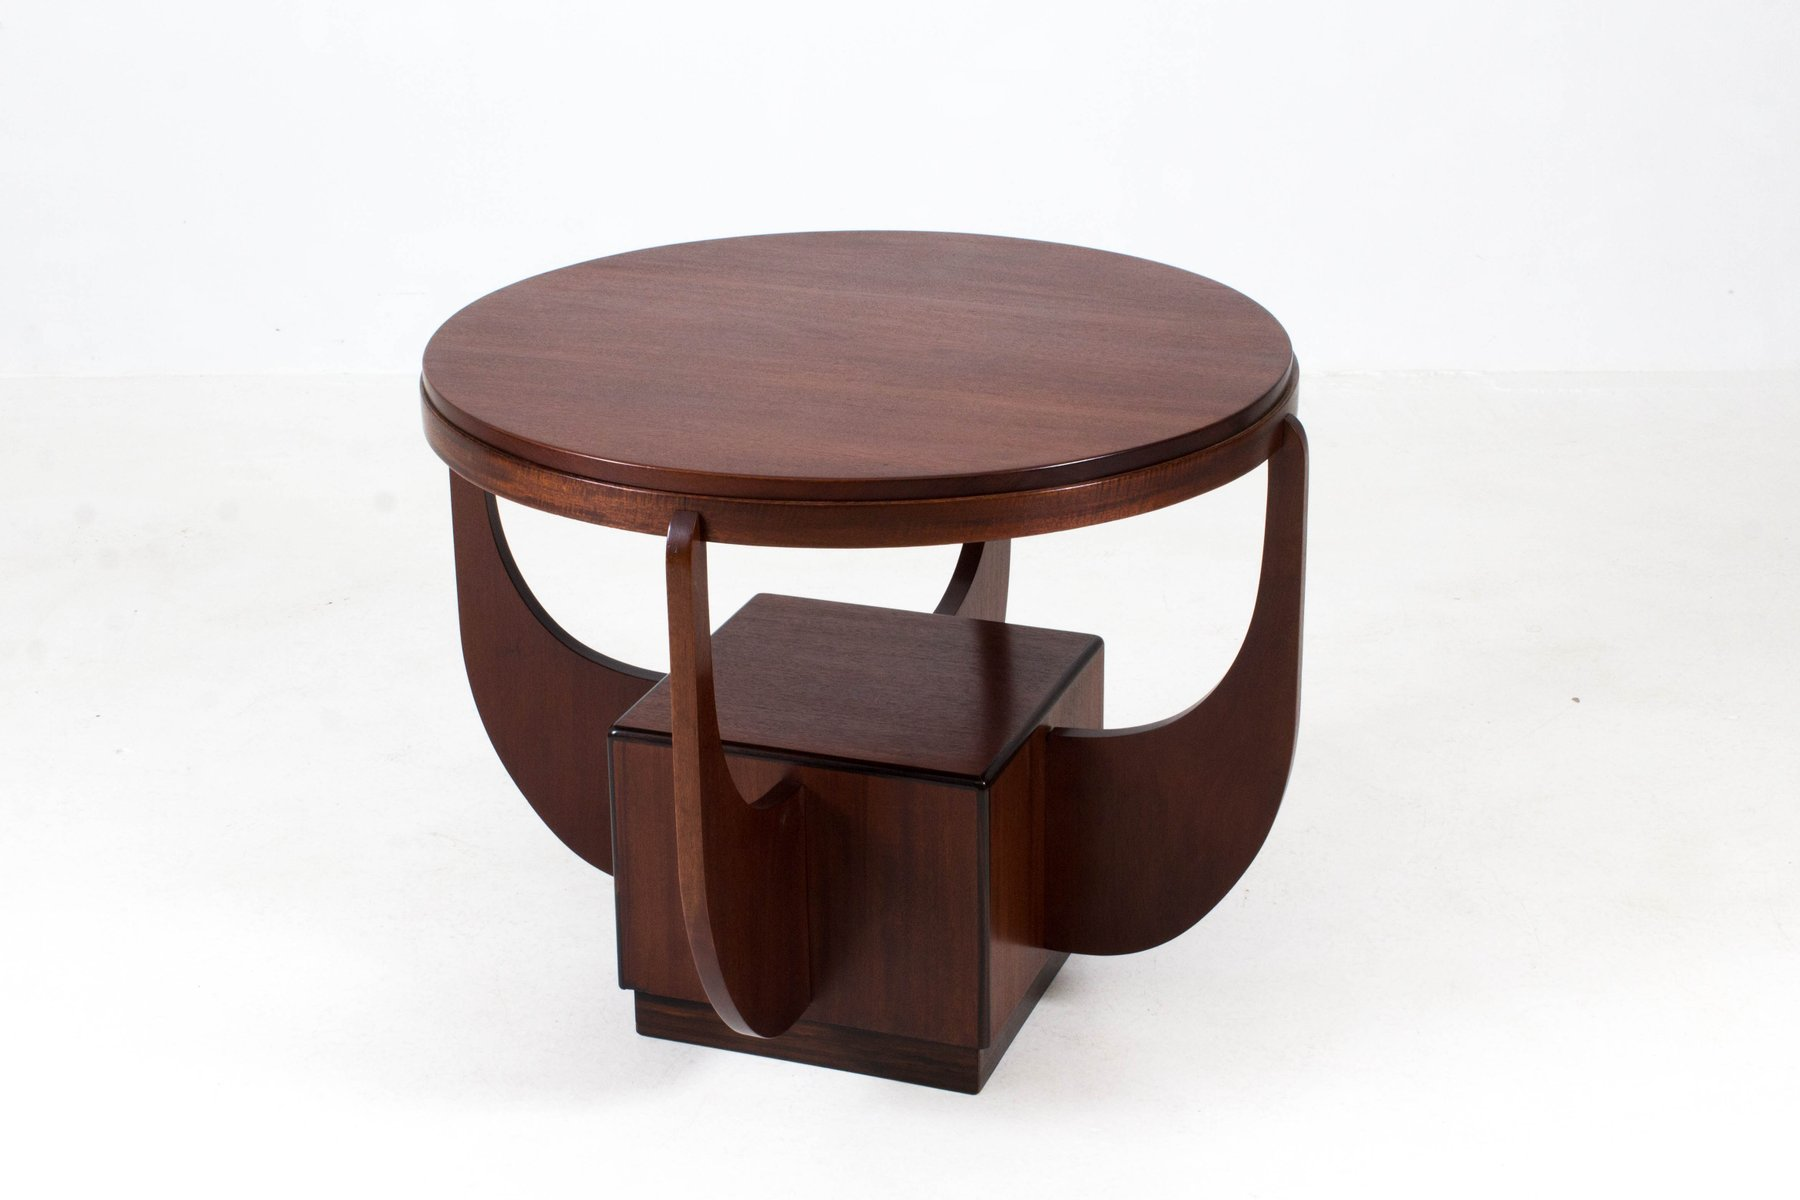 Marvelous Dutch Art Deco Mahogany Coffee Table From Paul Bromberg, 1920s